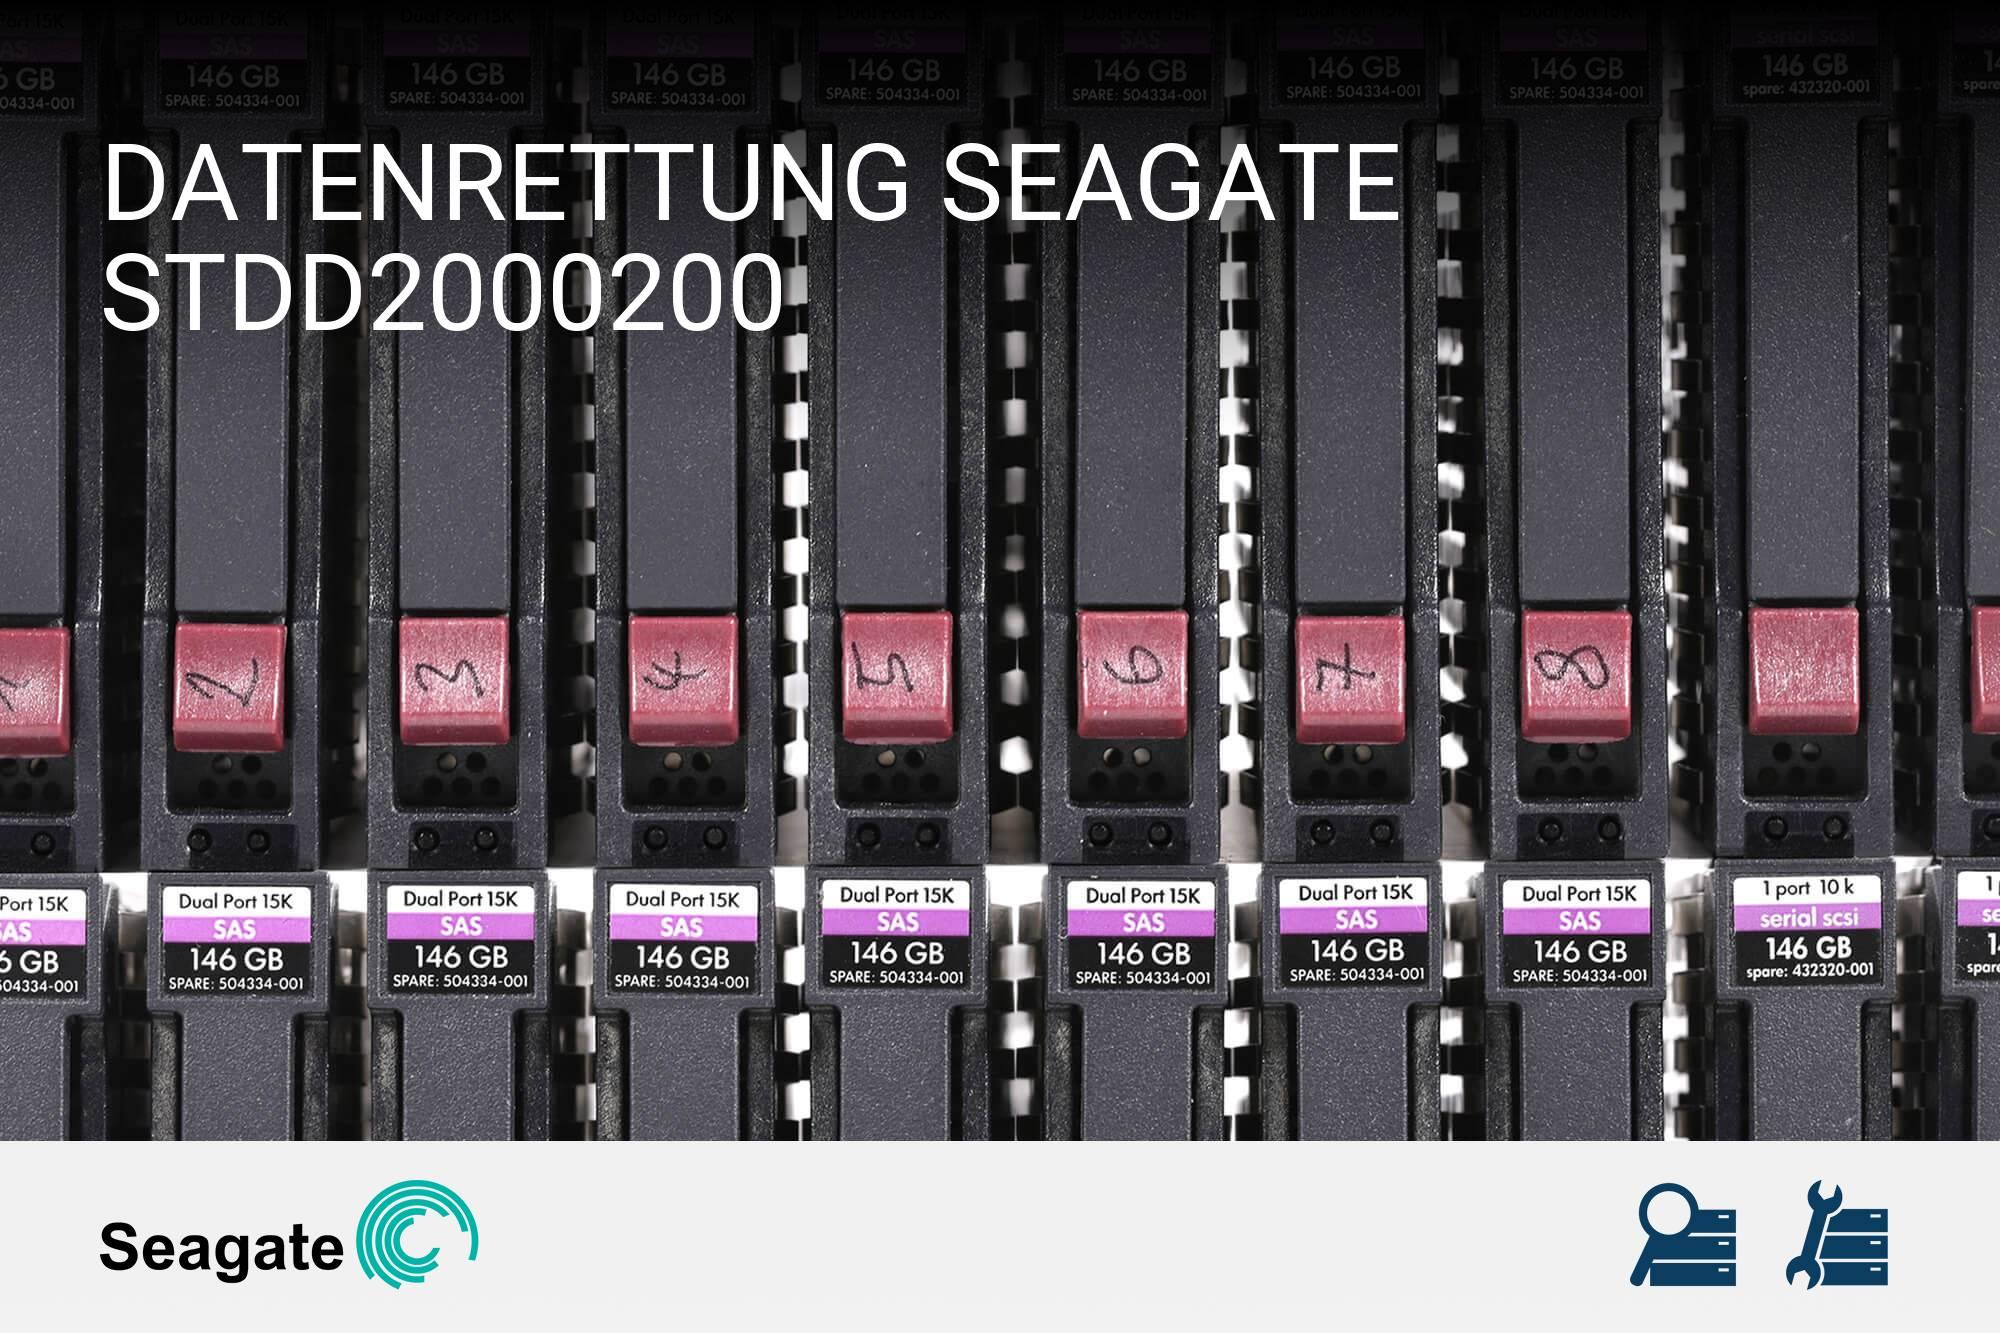 Seagate STDD2000200